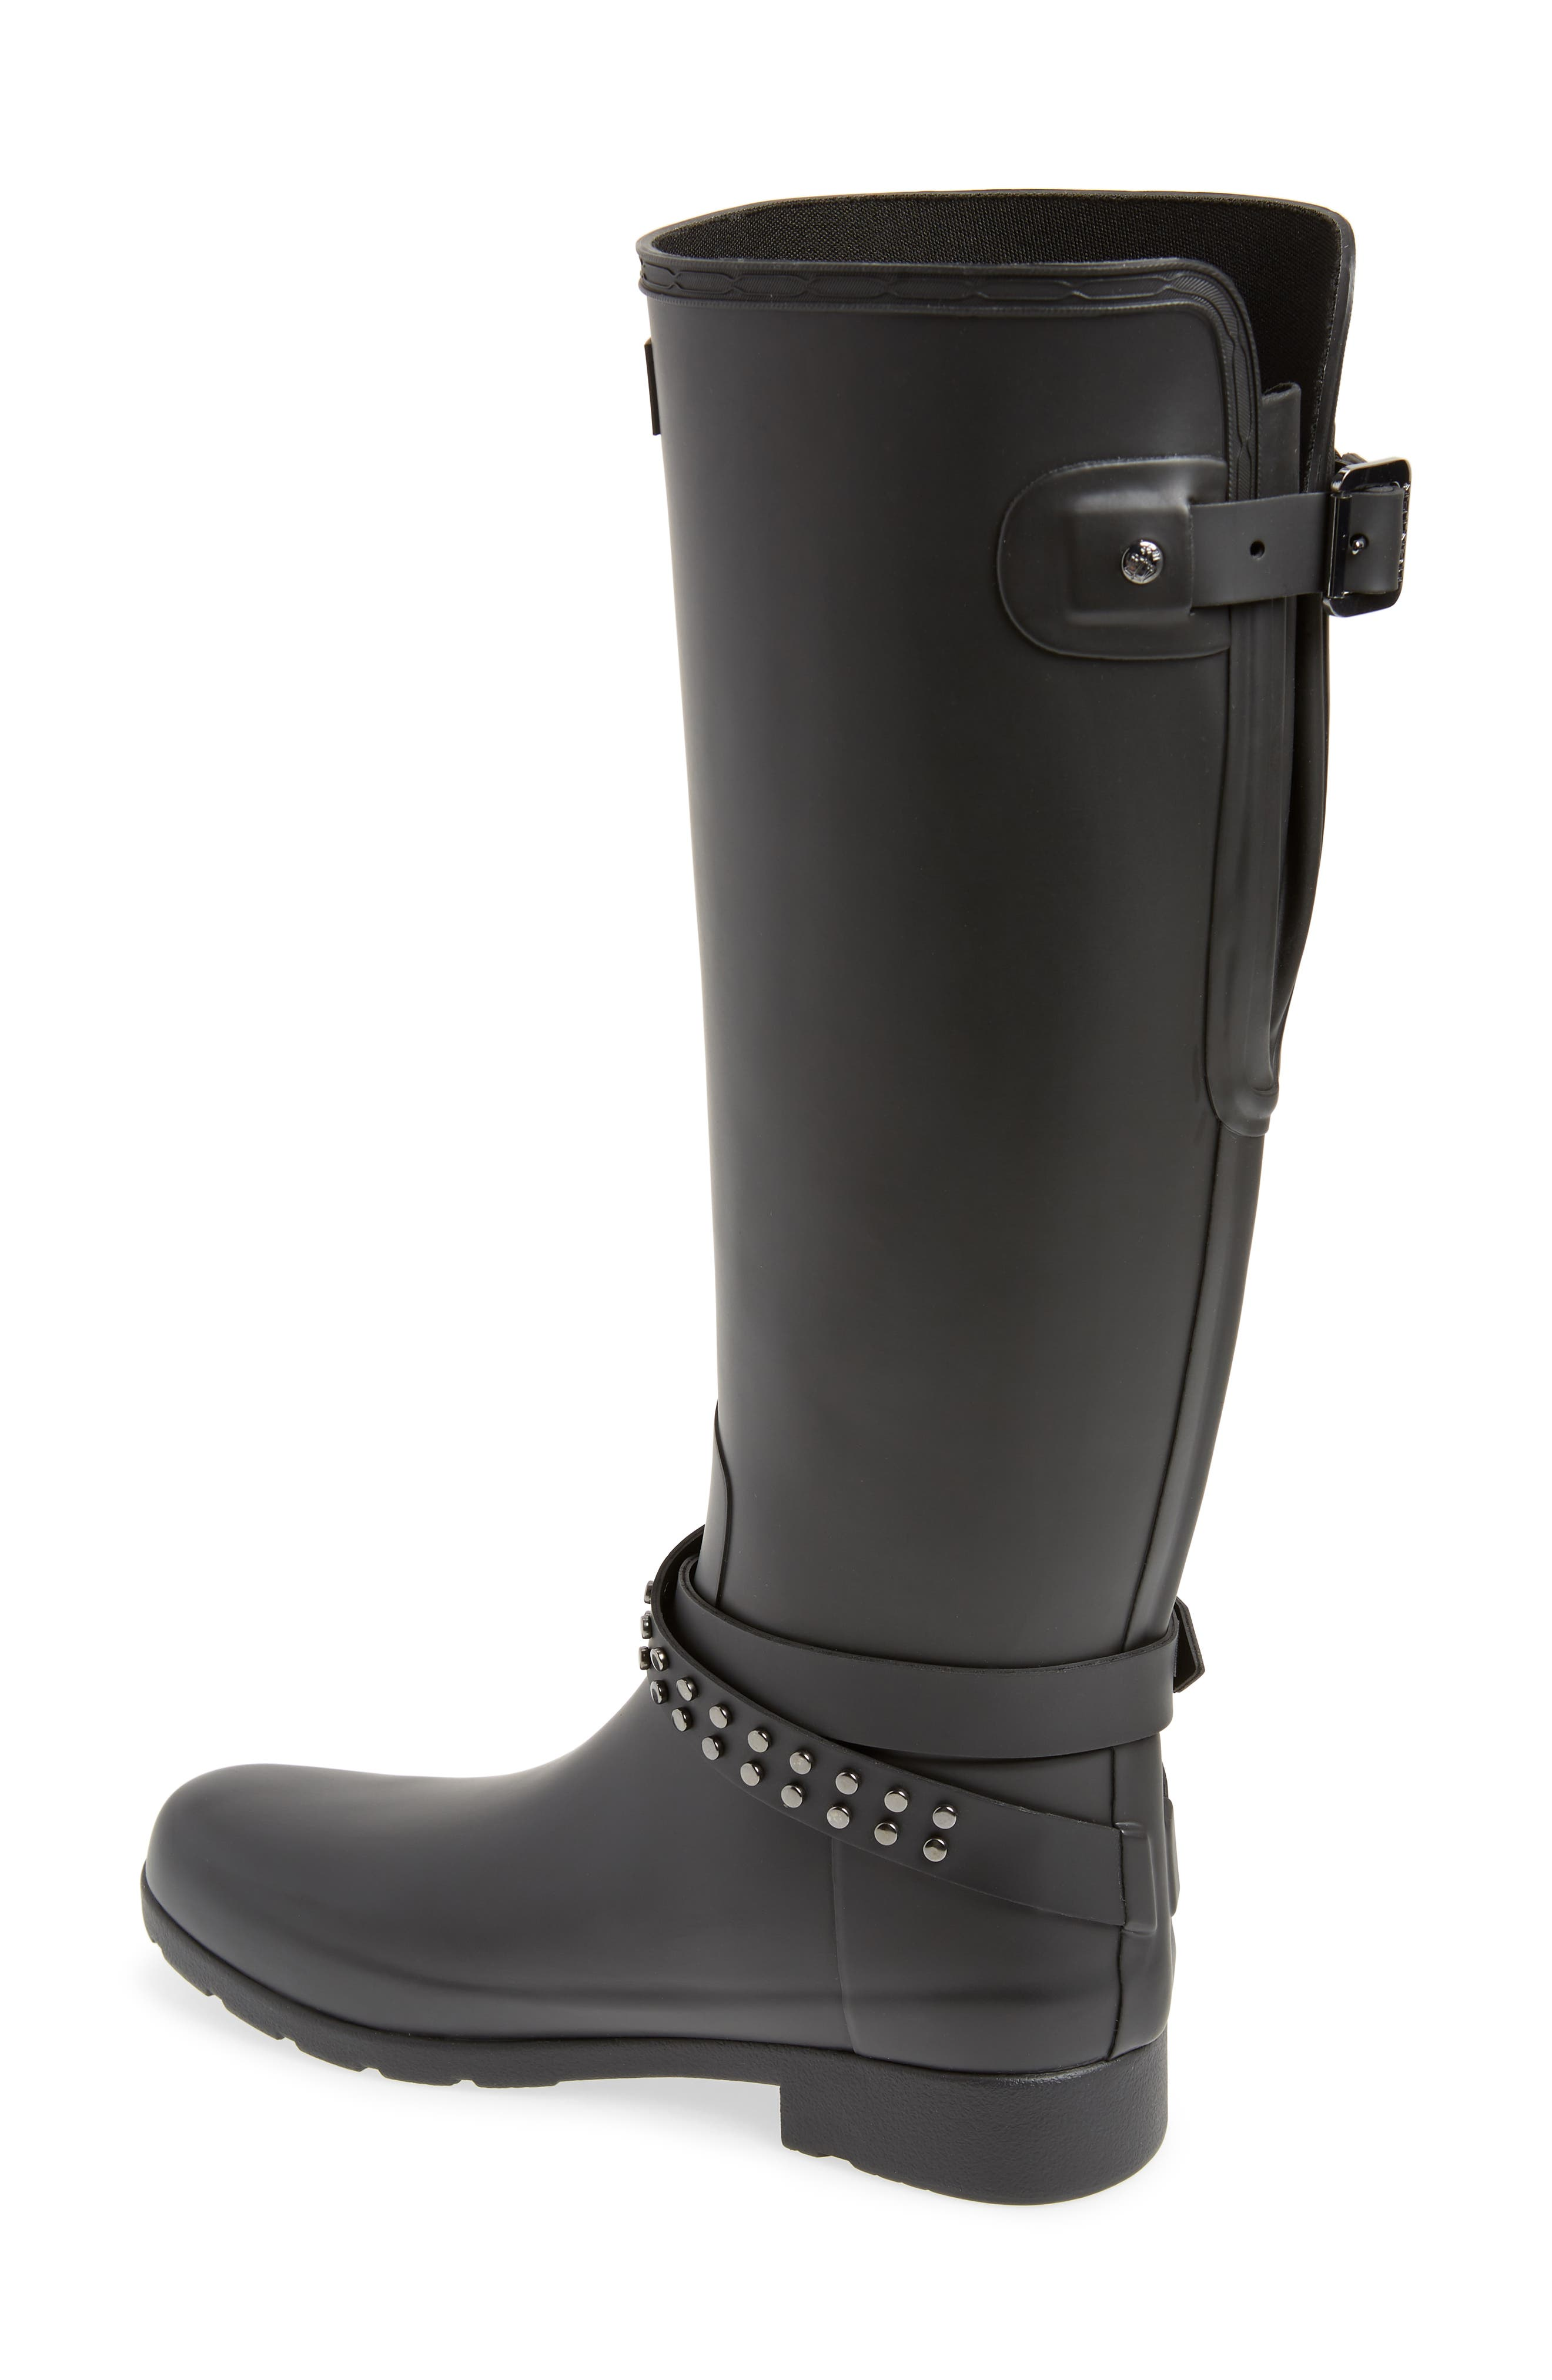 Refined Adjustable Back Knee High Waterproof Rain Boot,                             Alternate thumbnail 2, color,                             BLACK